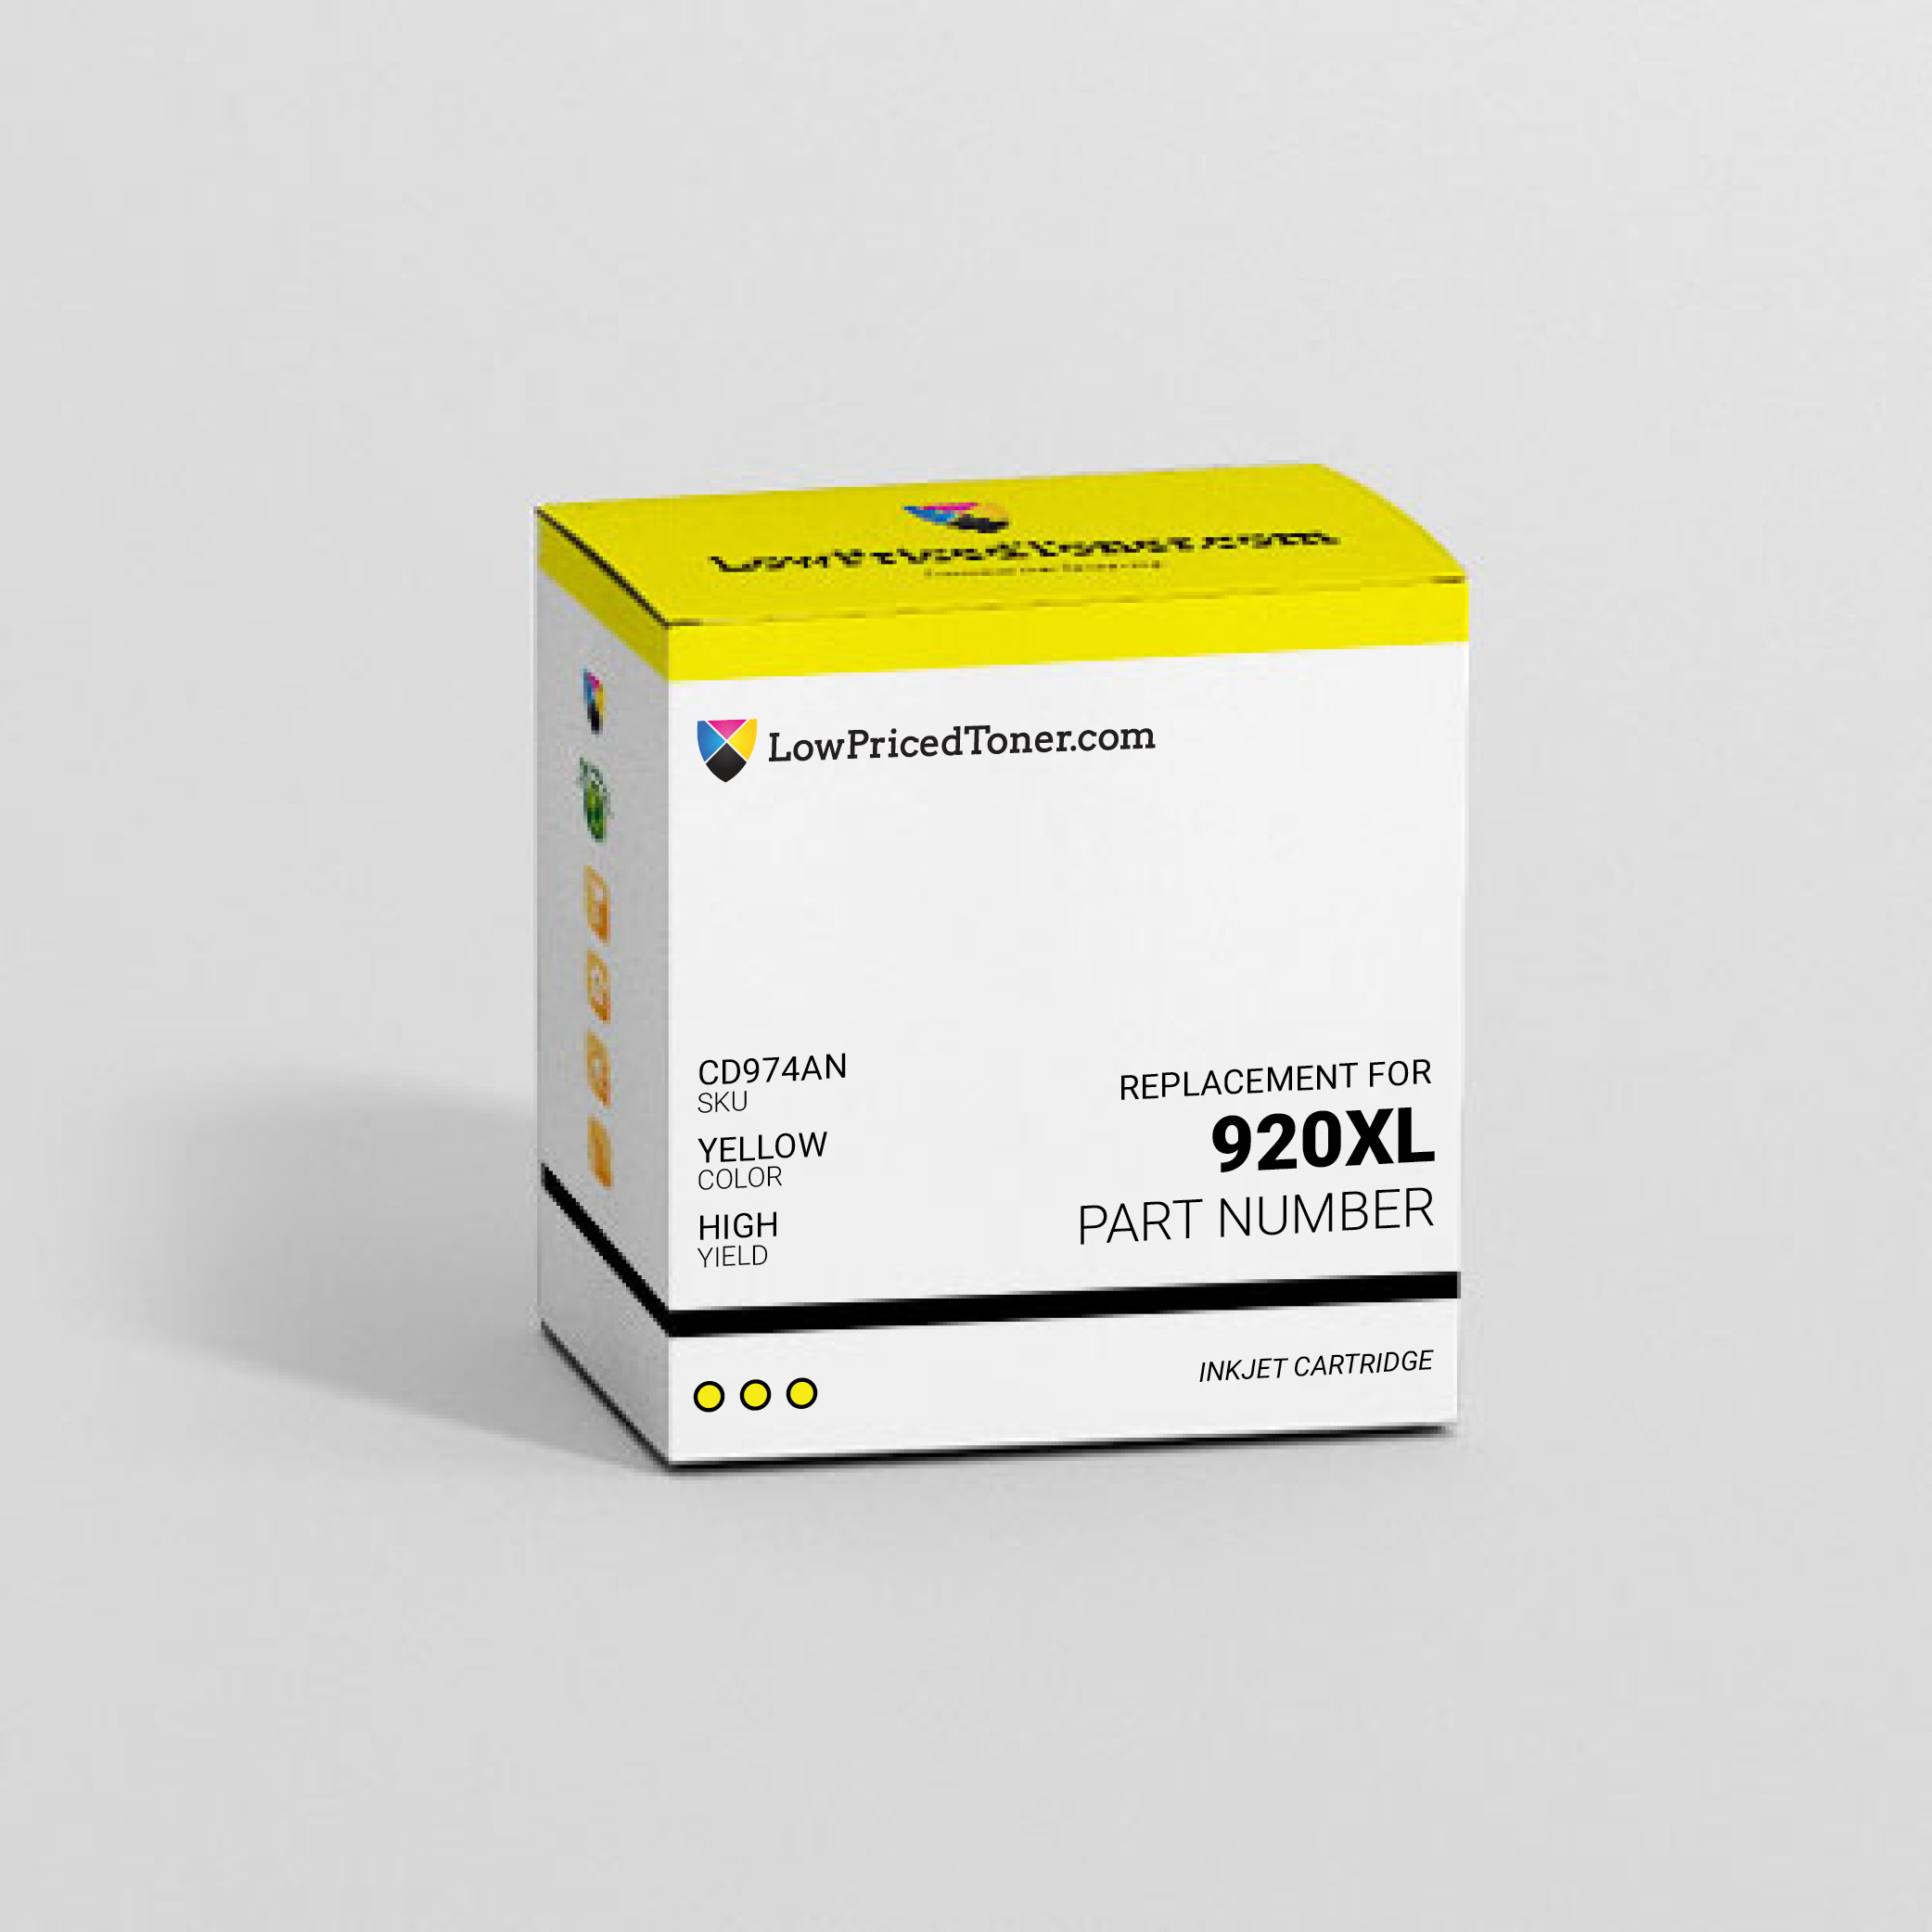 HP CD974AN 920XL Remanufactured Yellow Ink Cartridge High Yield